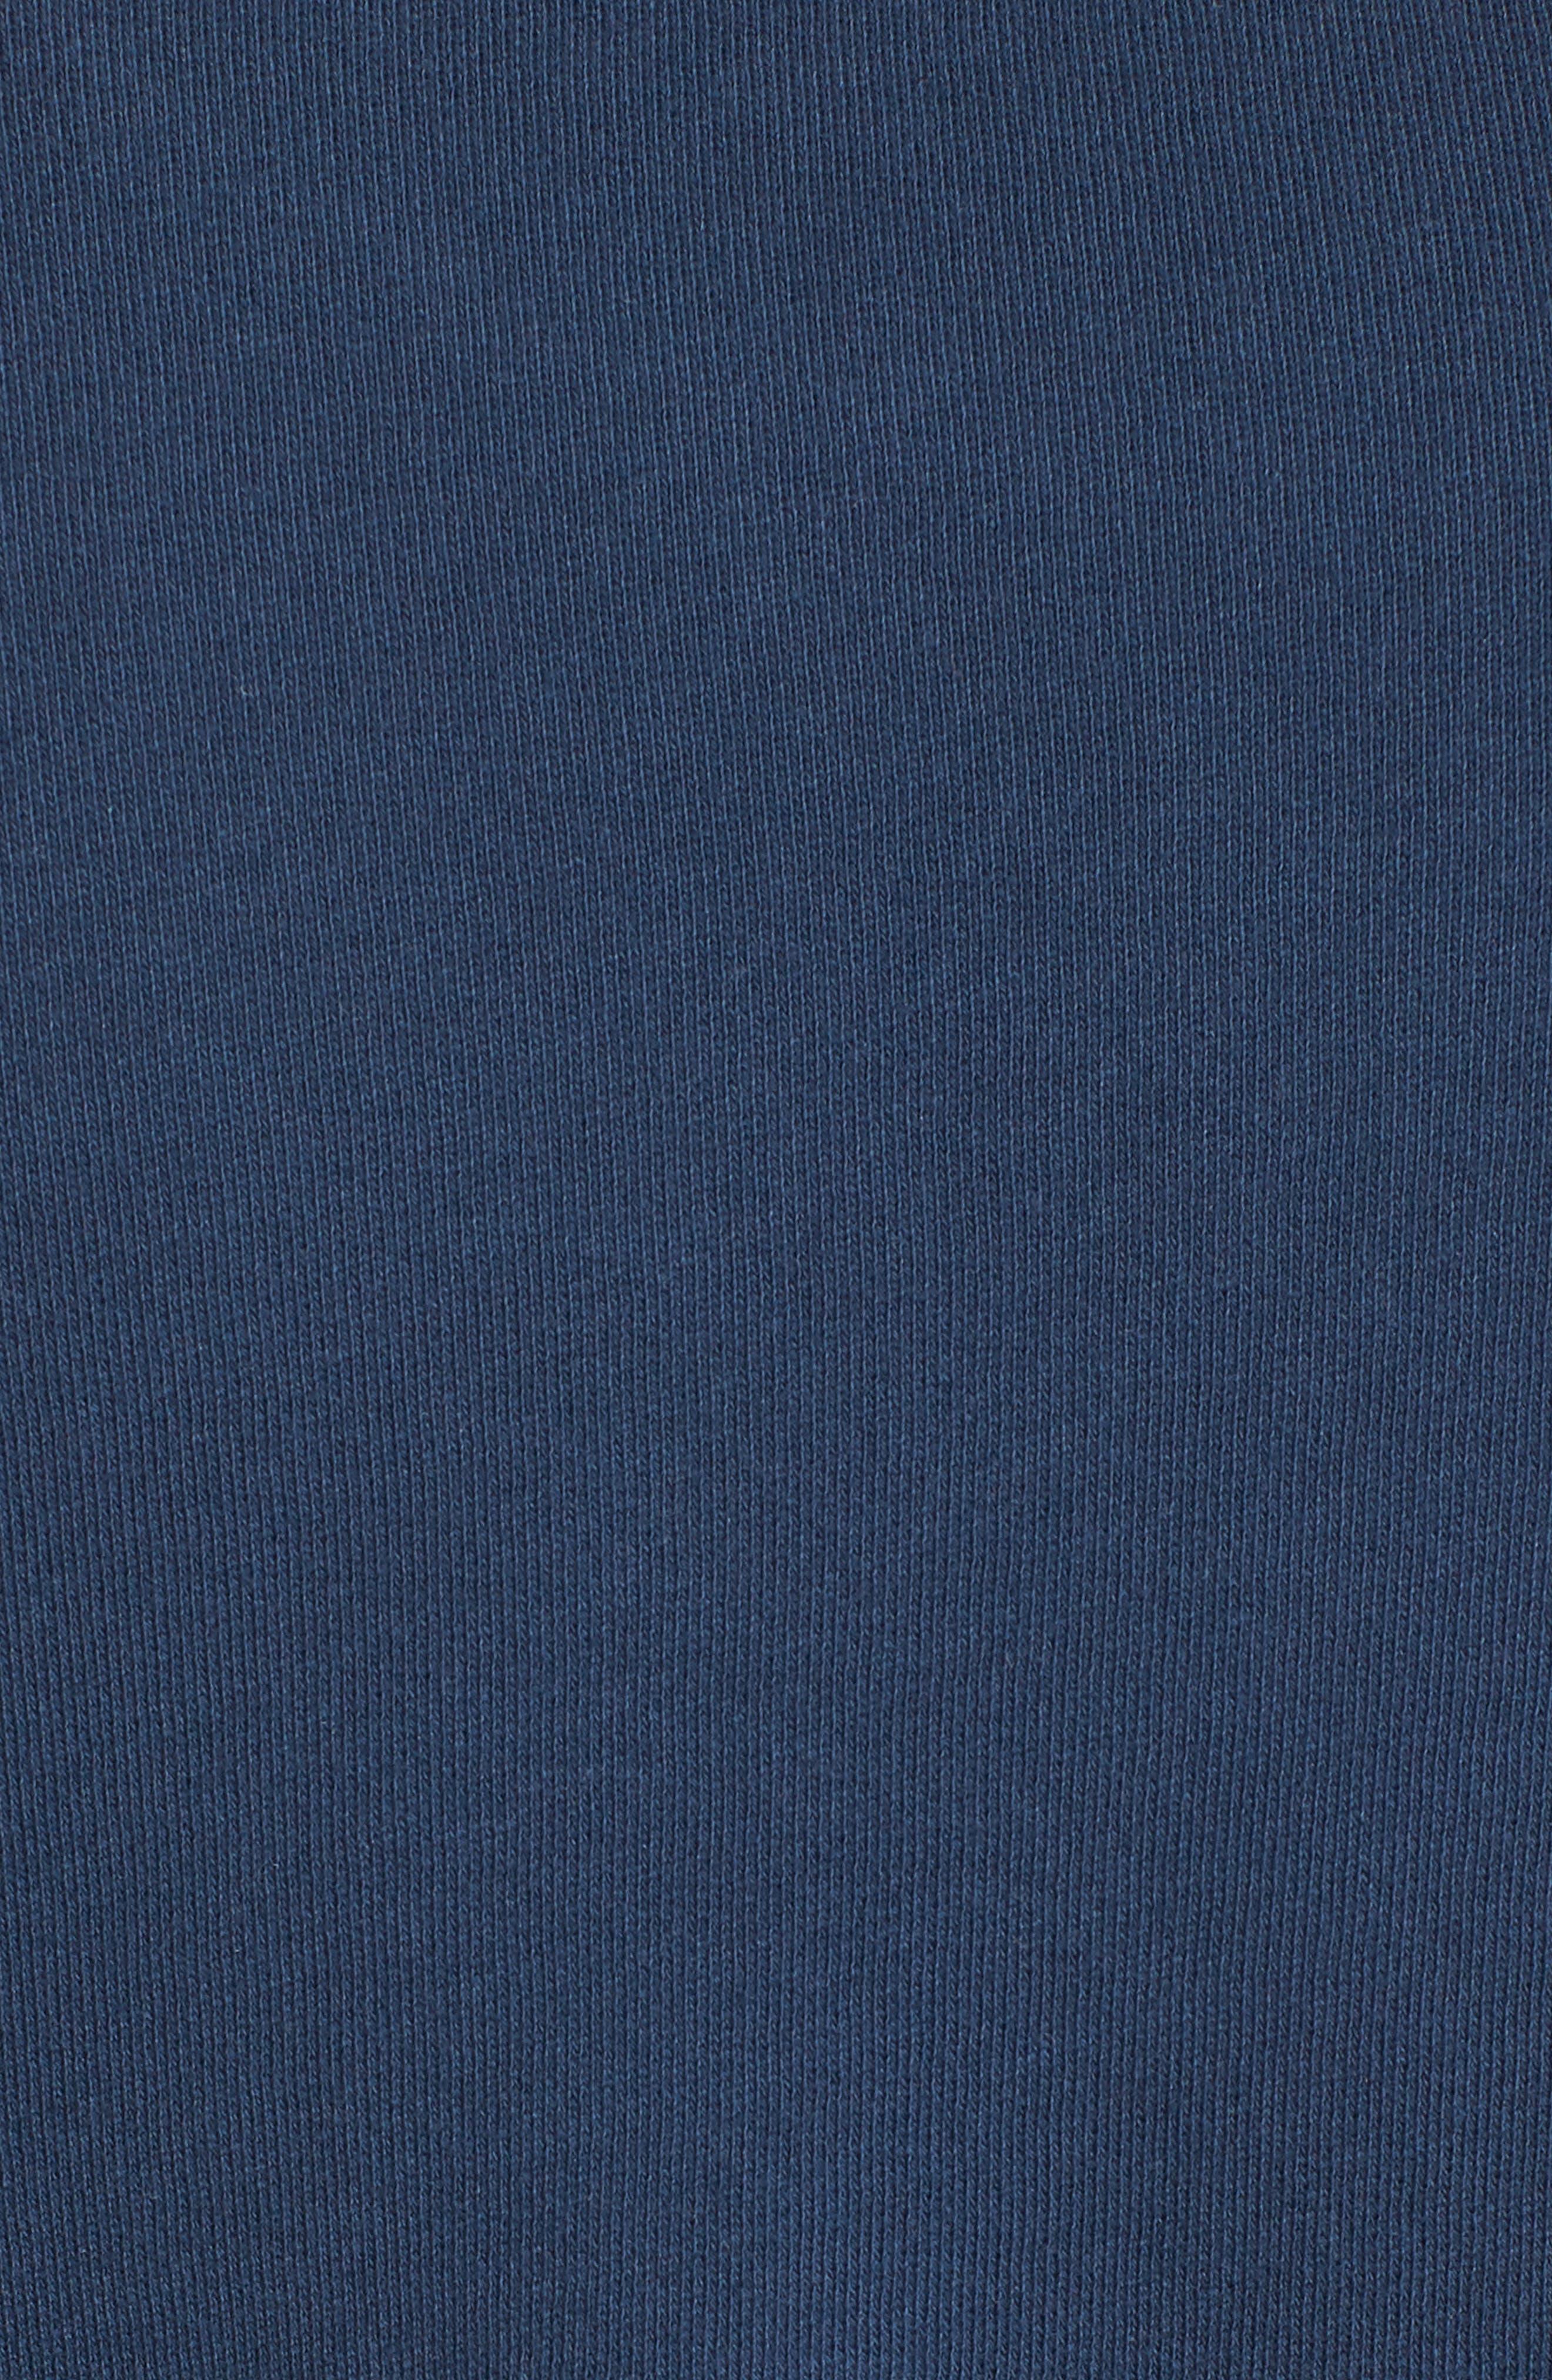 Alexa - Fashion Mafia Sweatshirt,                             Alternate thumbnail 6, color,